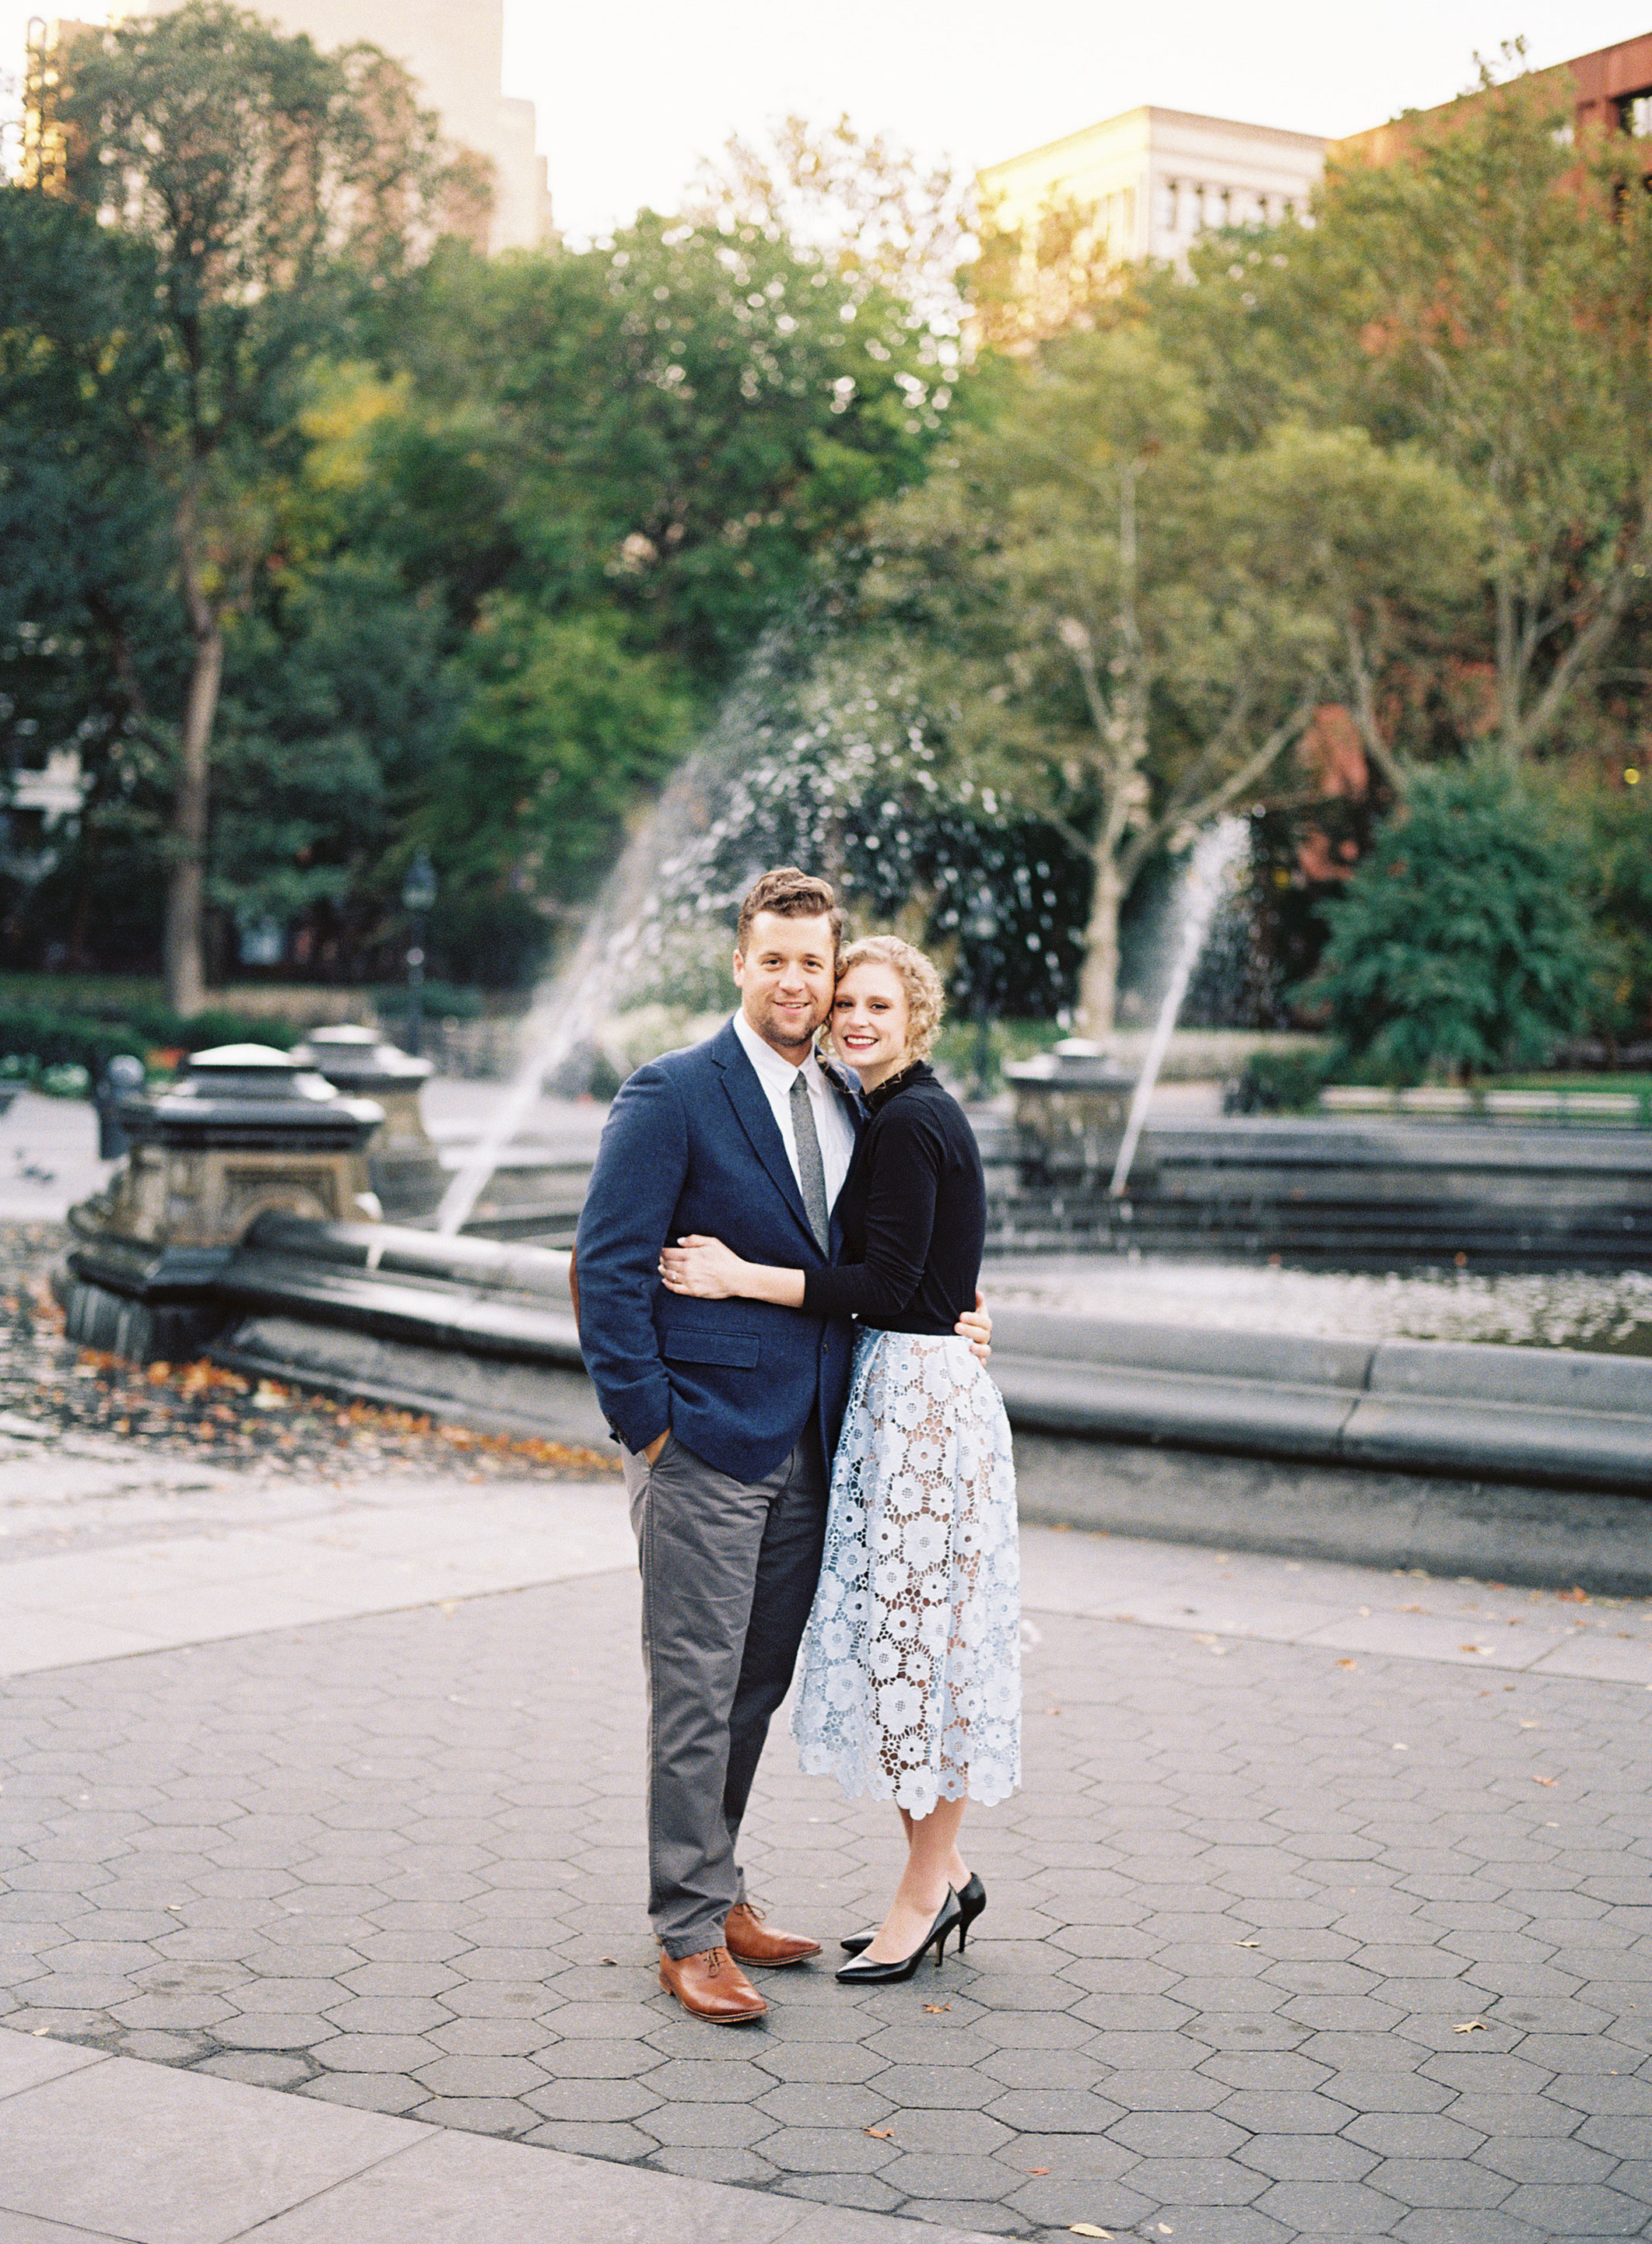 engagement photo ideas judy pak